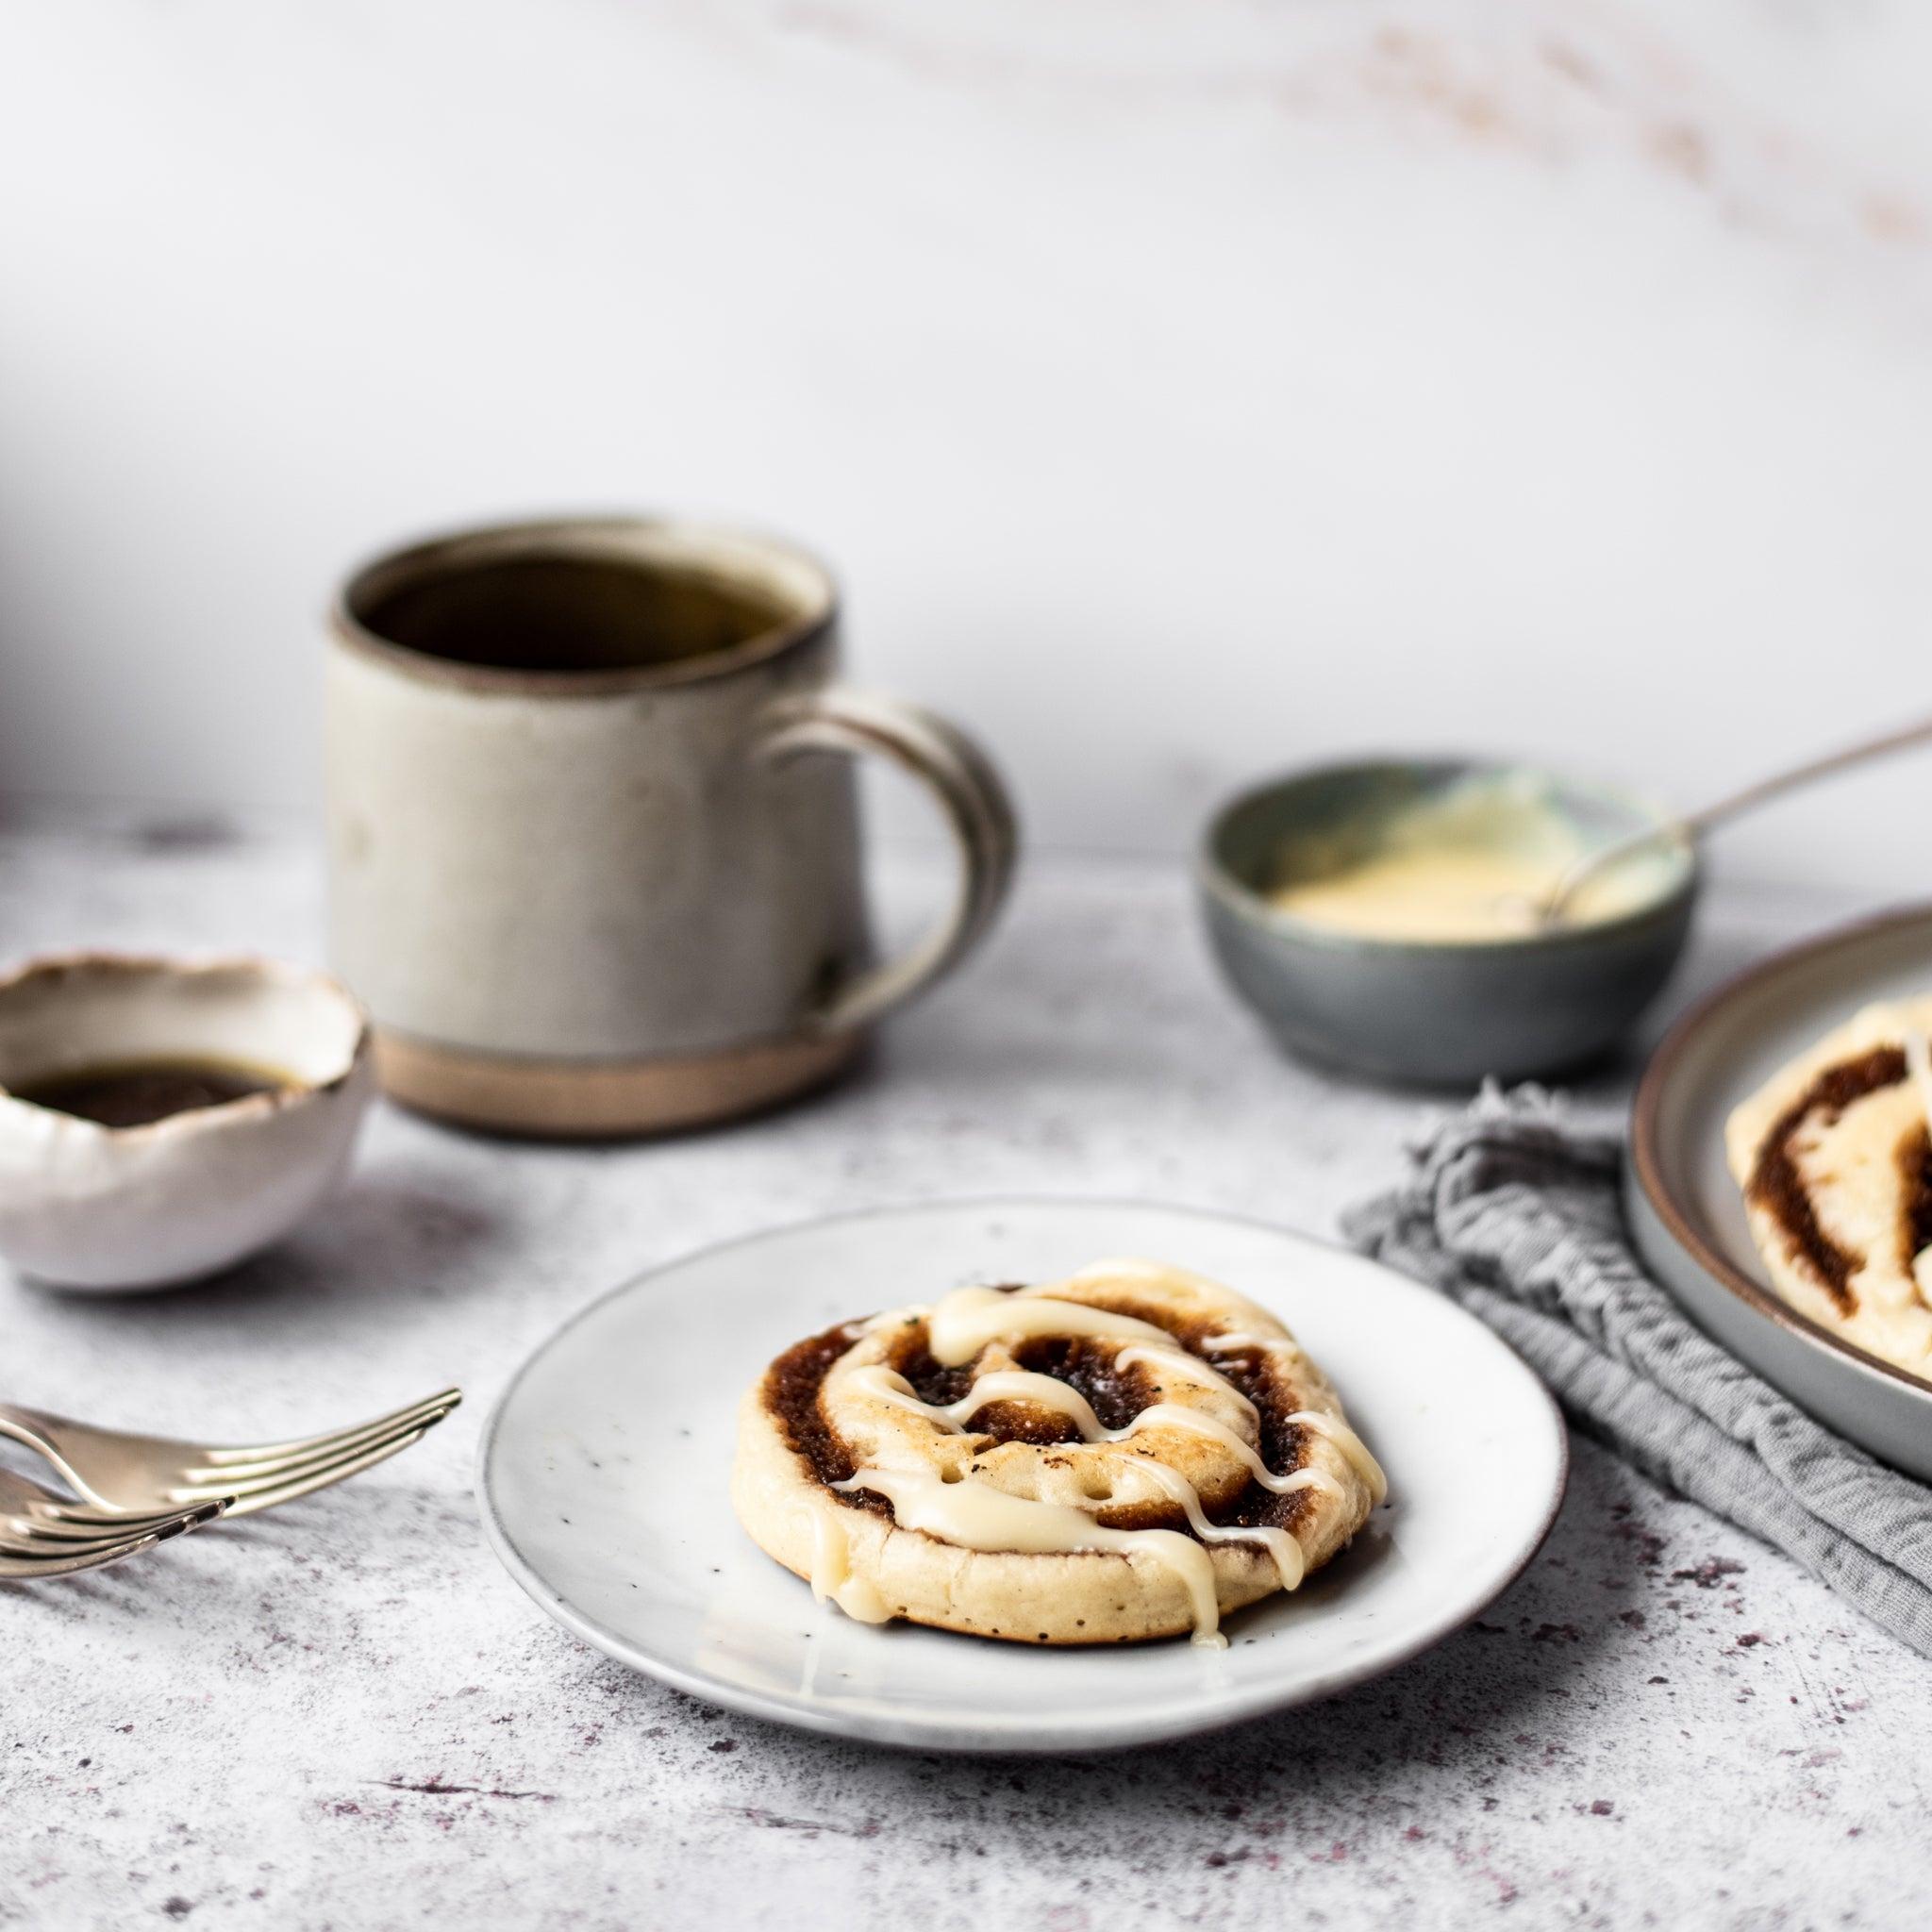 Cinnamon-Swirl-Pancakes-SQUARE-1.jpg